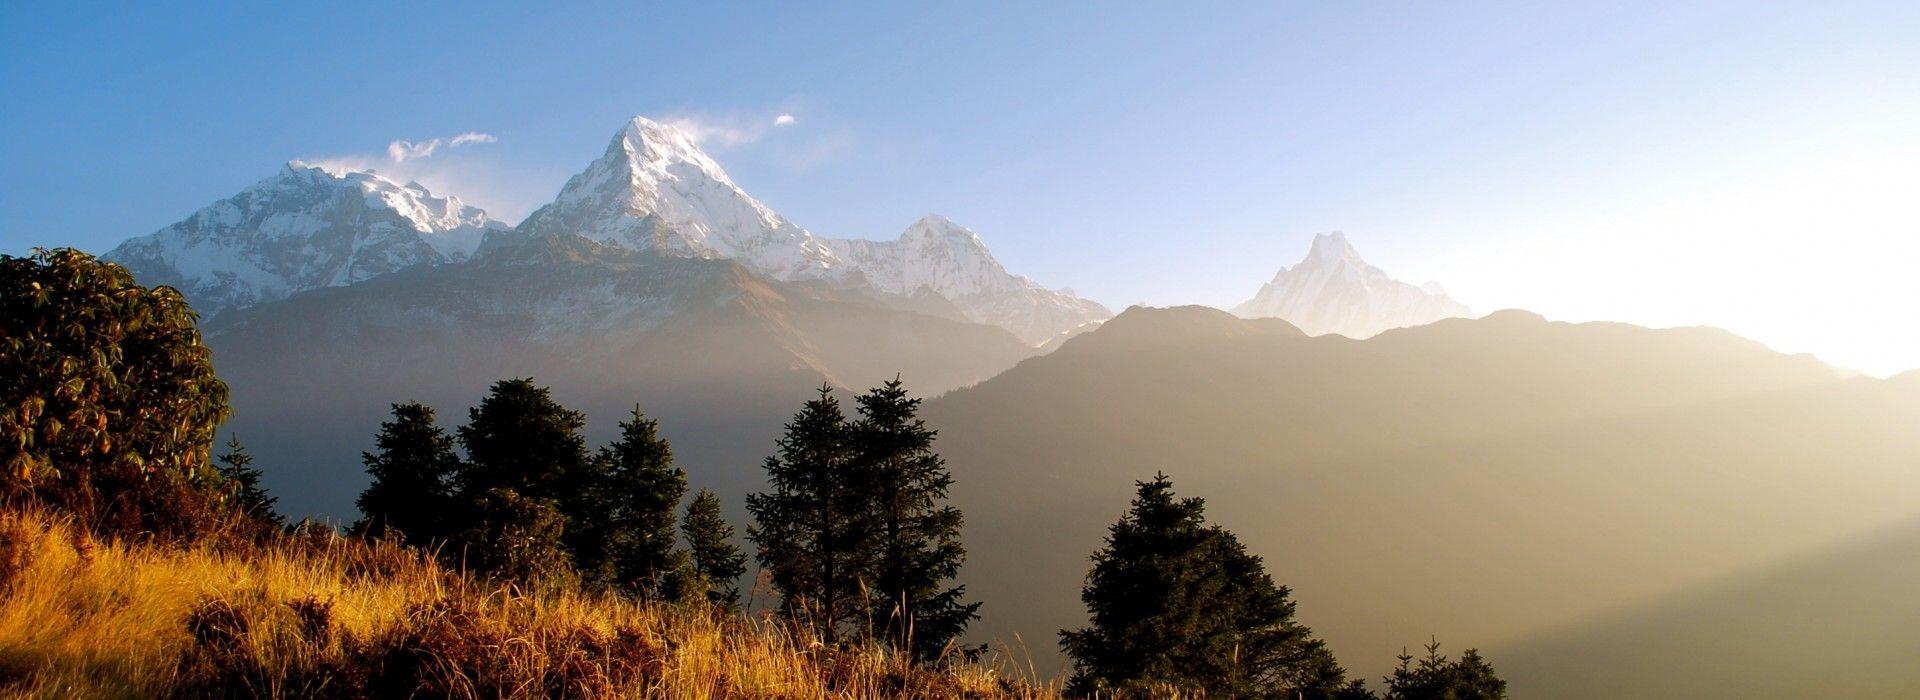 Everest Region Tours